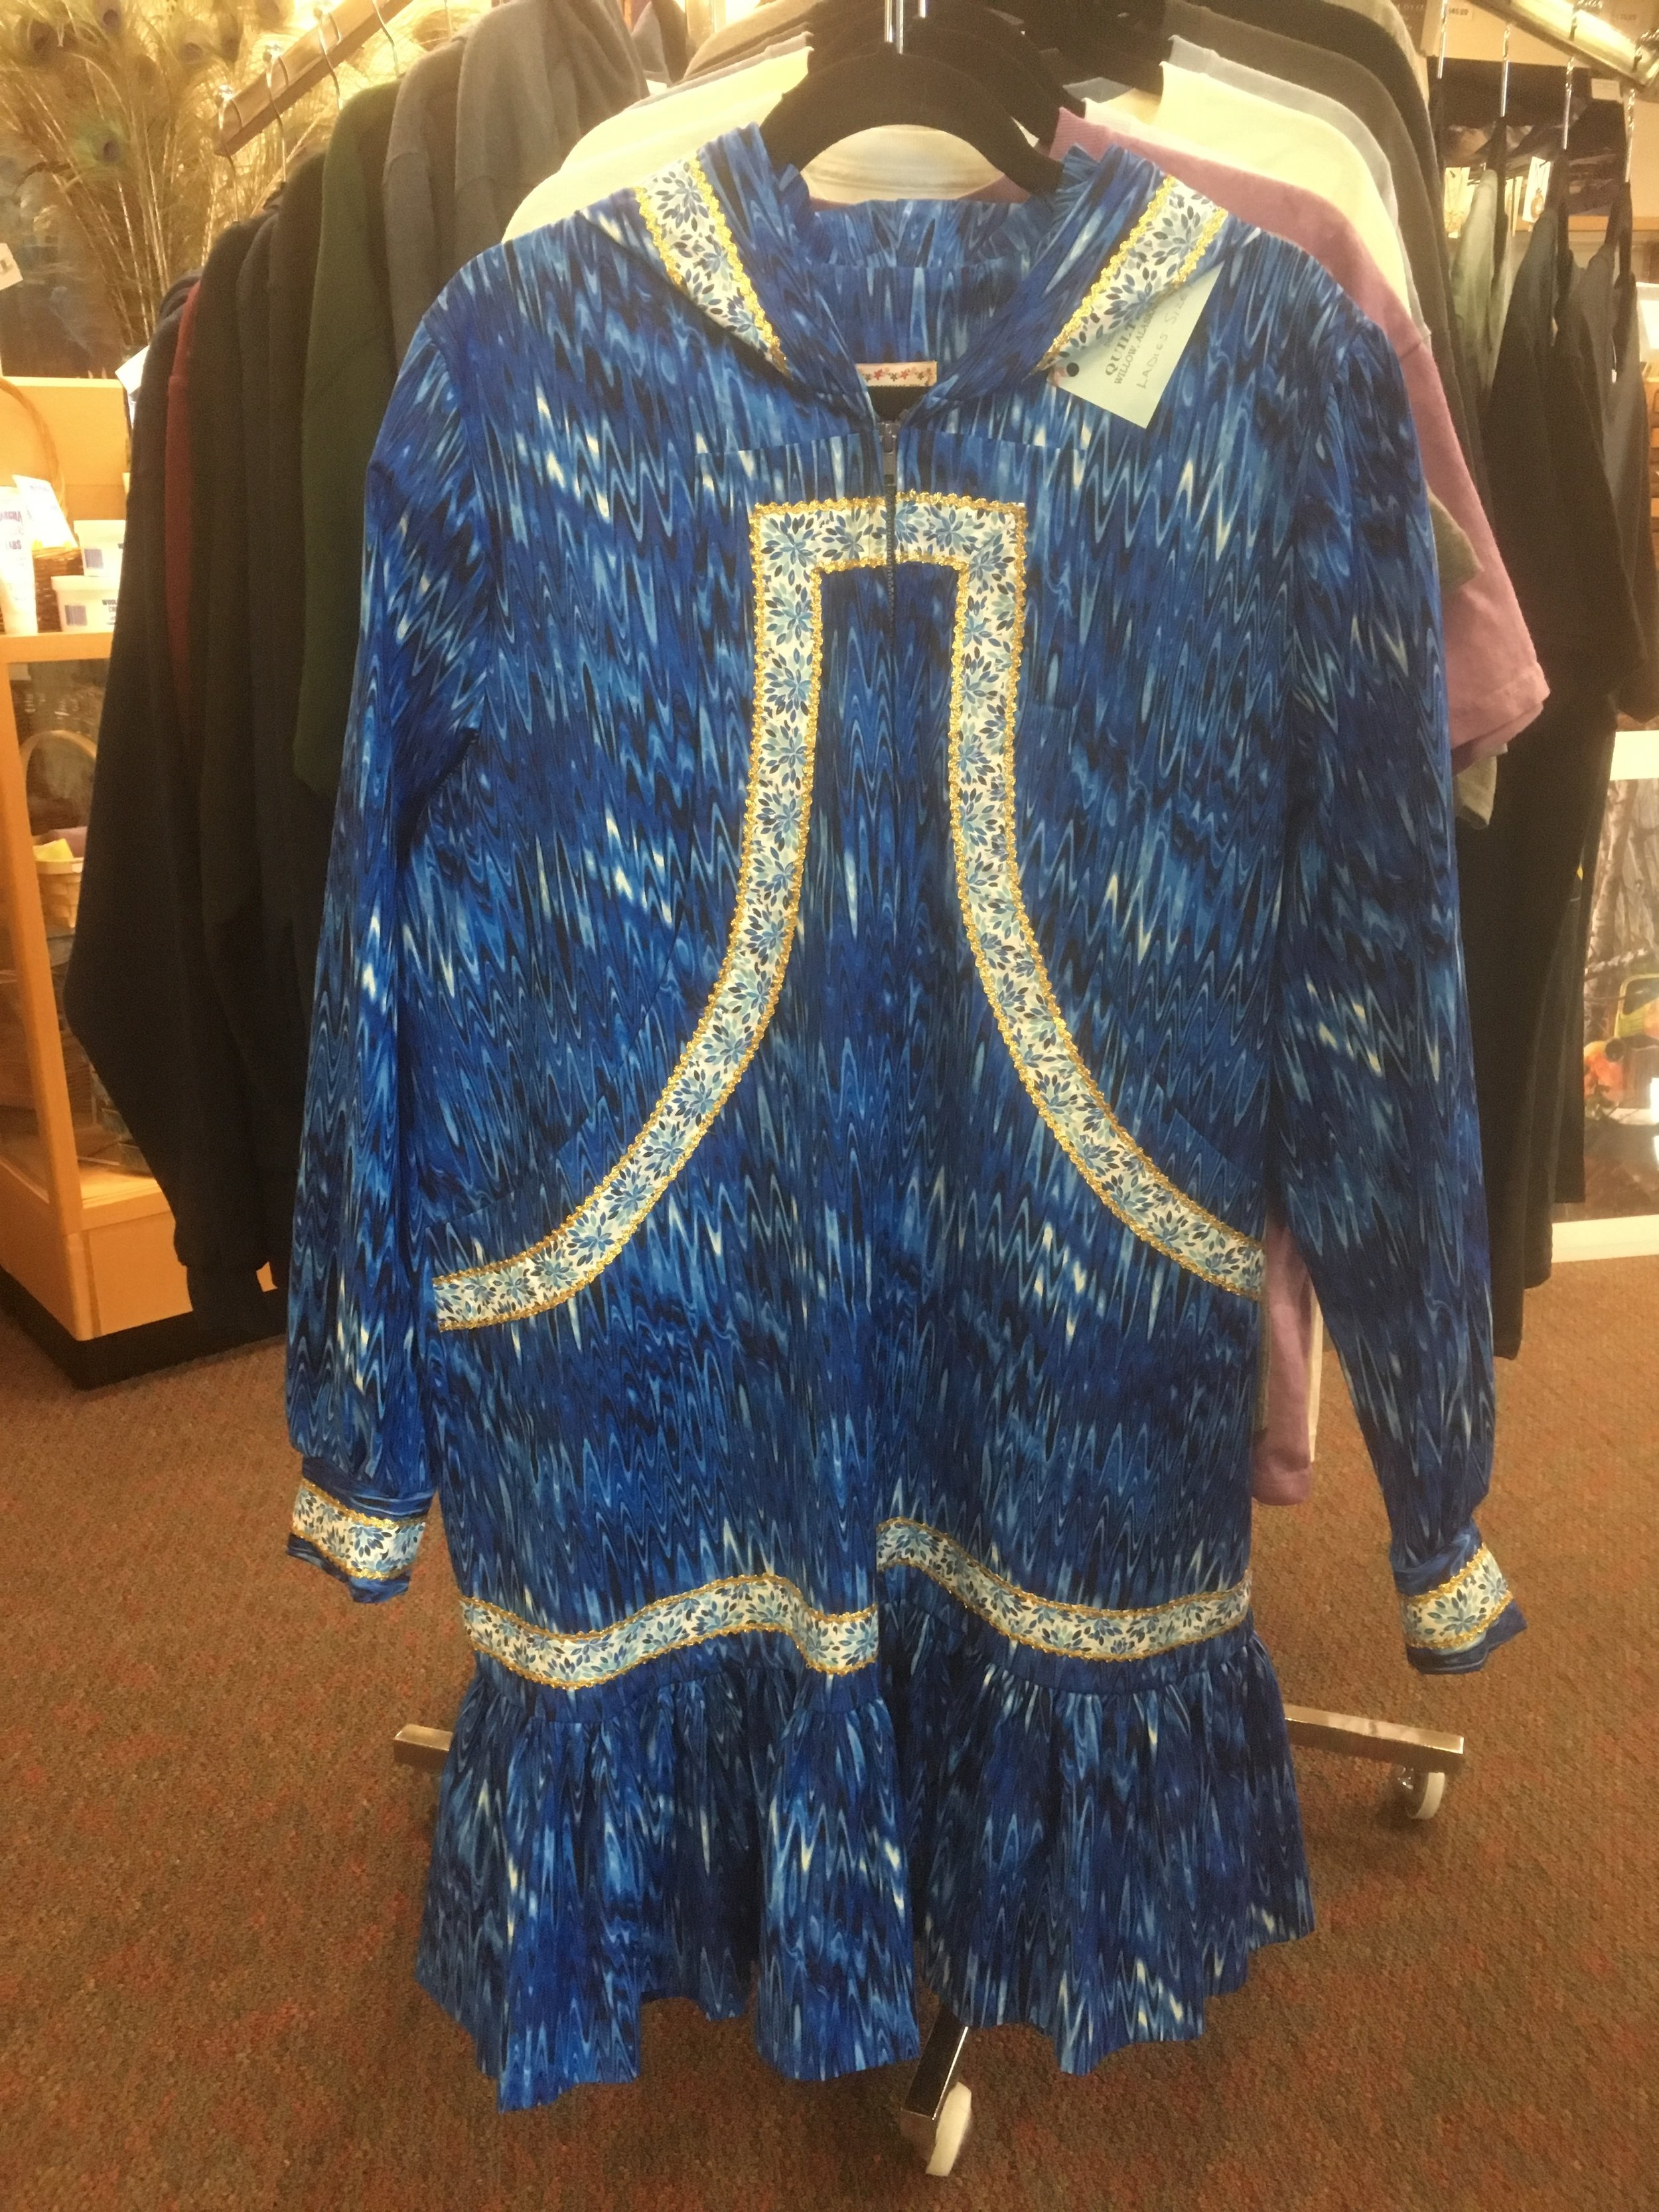 MAS - Kuspuks - An Alaskan Fashion Statement (1) WEB.JPG